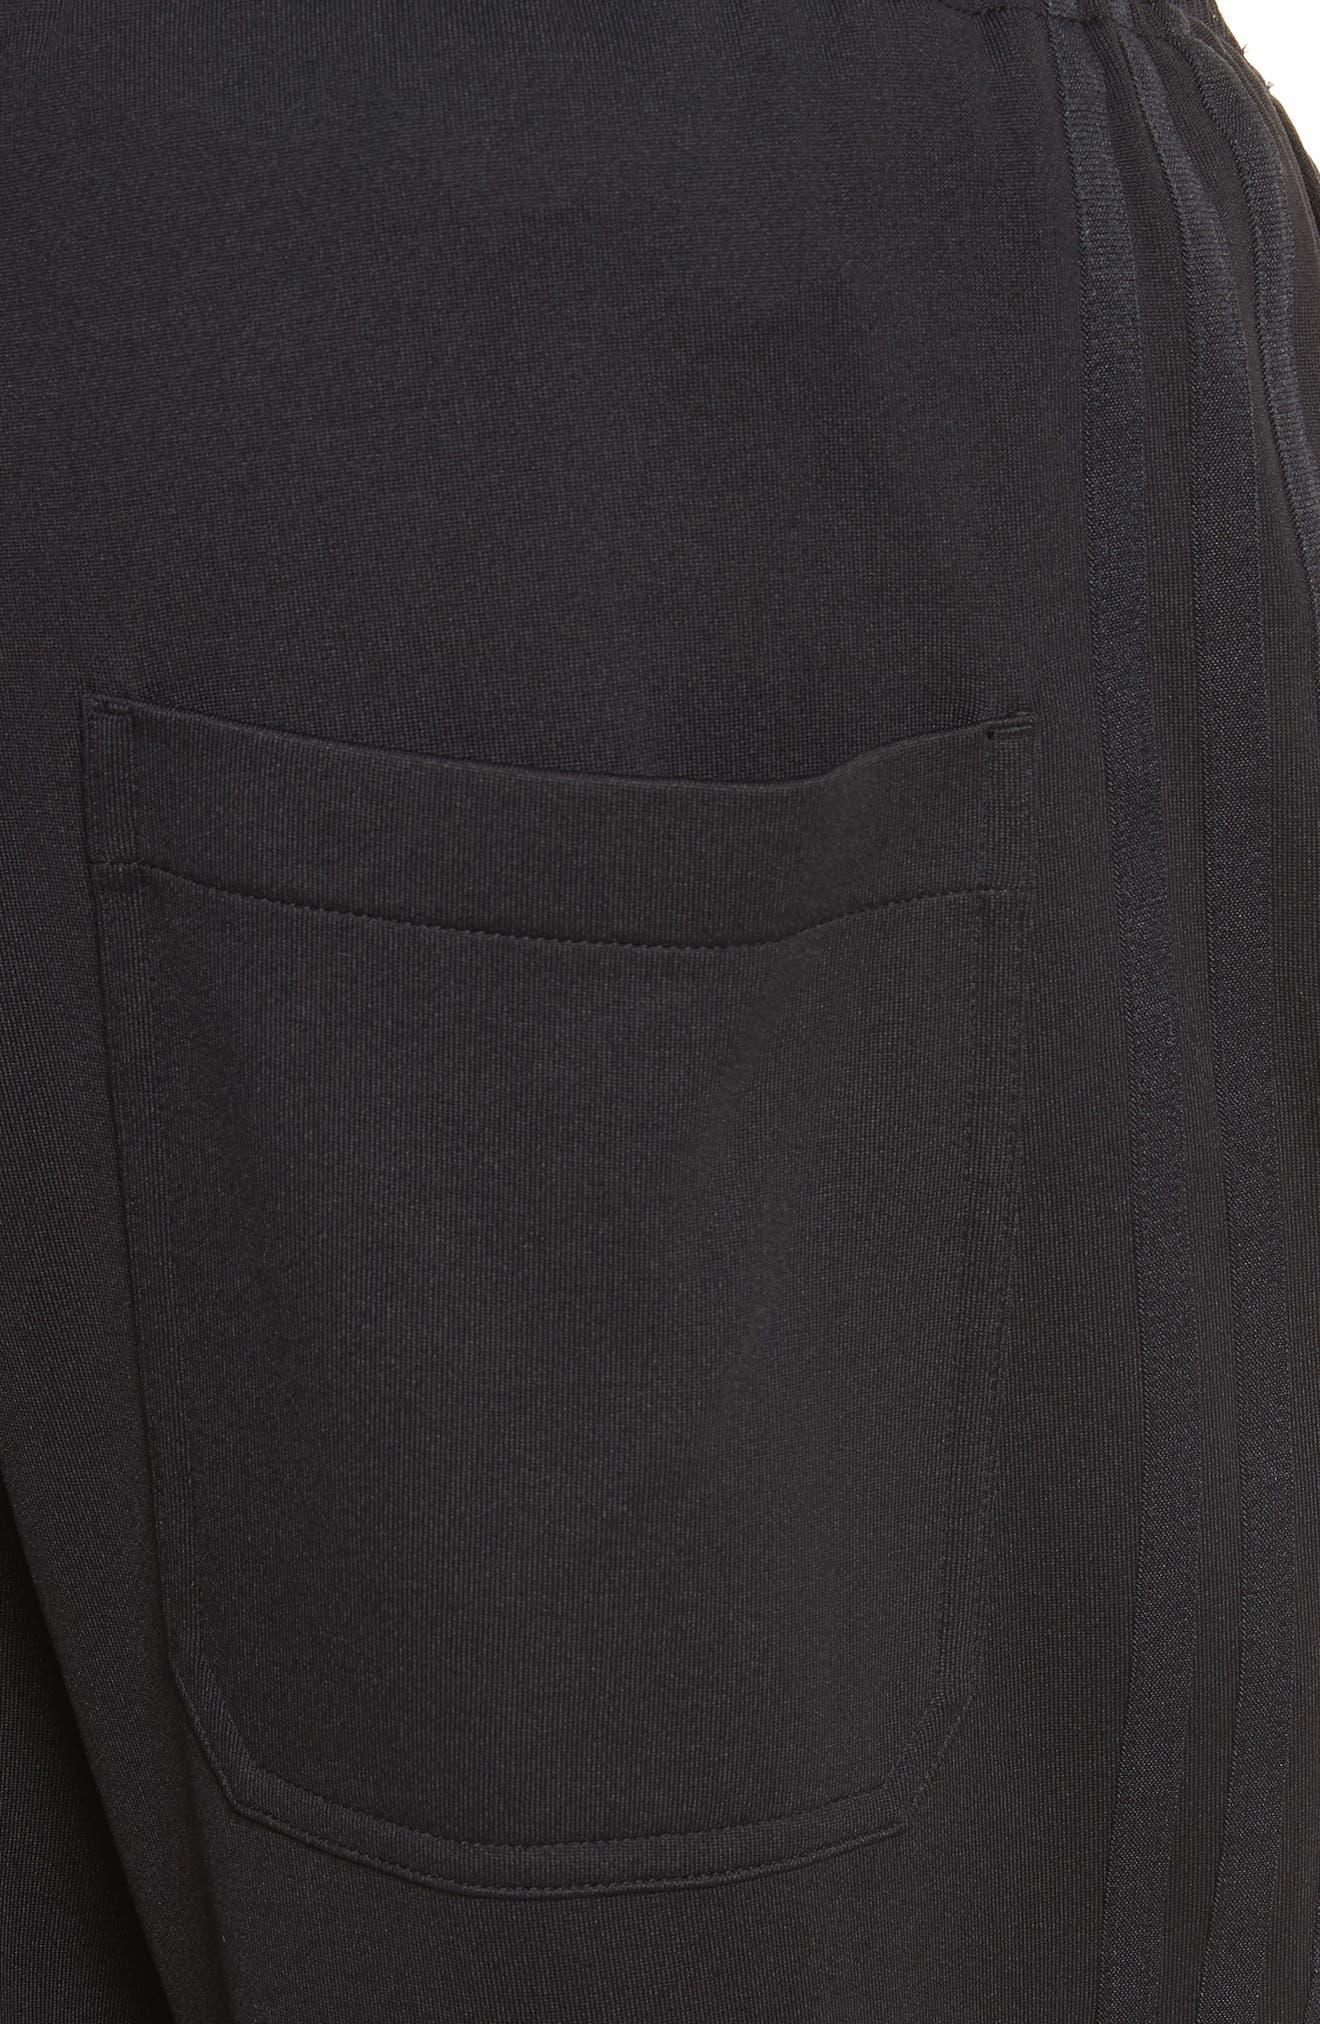 x adidas Wide Leg Track Pants,                             Alternate thumbnail 5, color,                             001